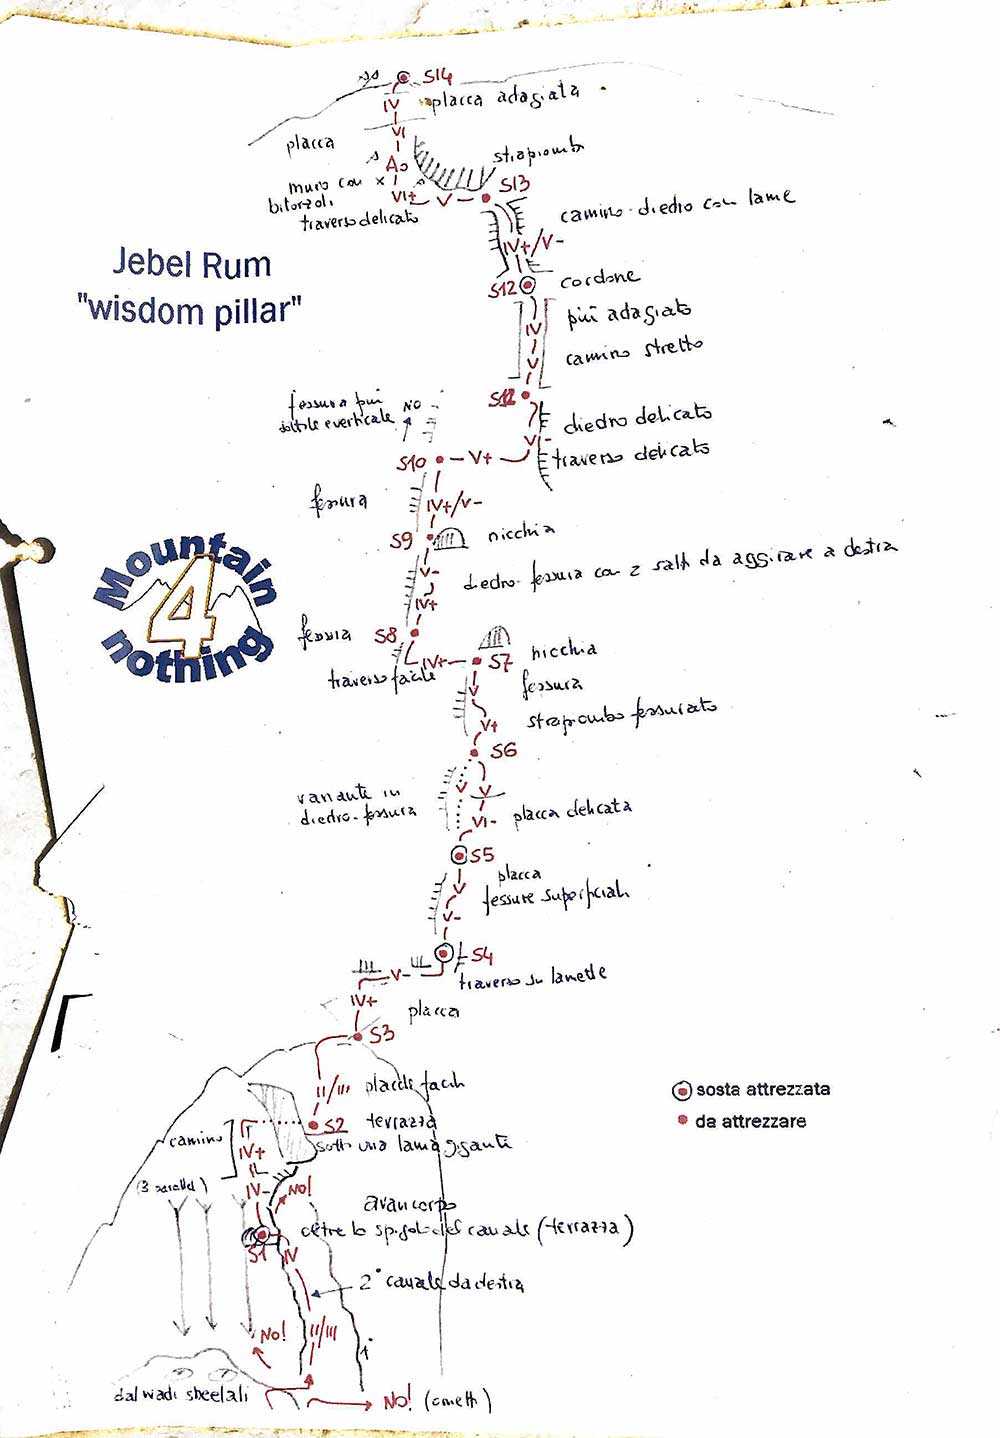 Jebel-Rum Wisdom-pillar